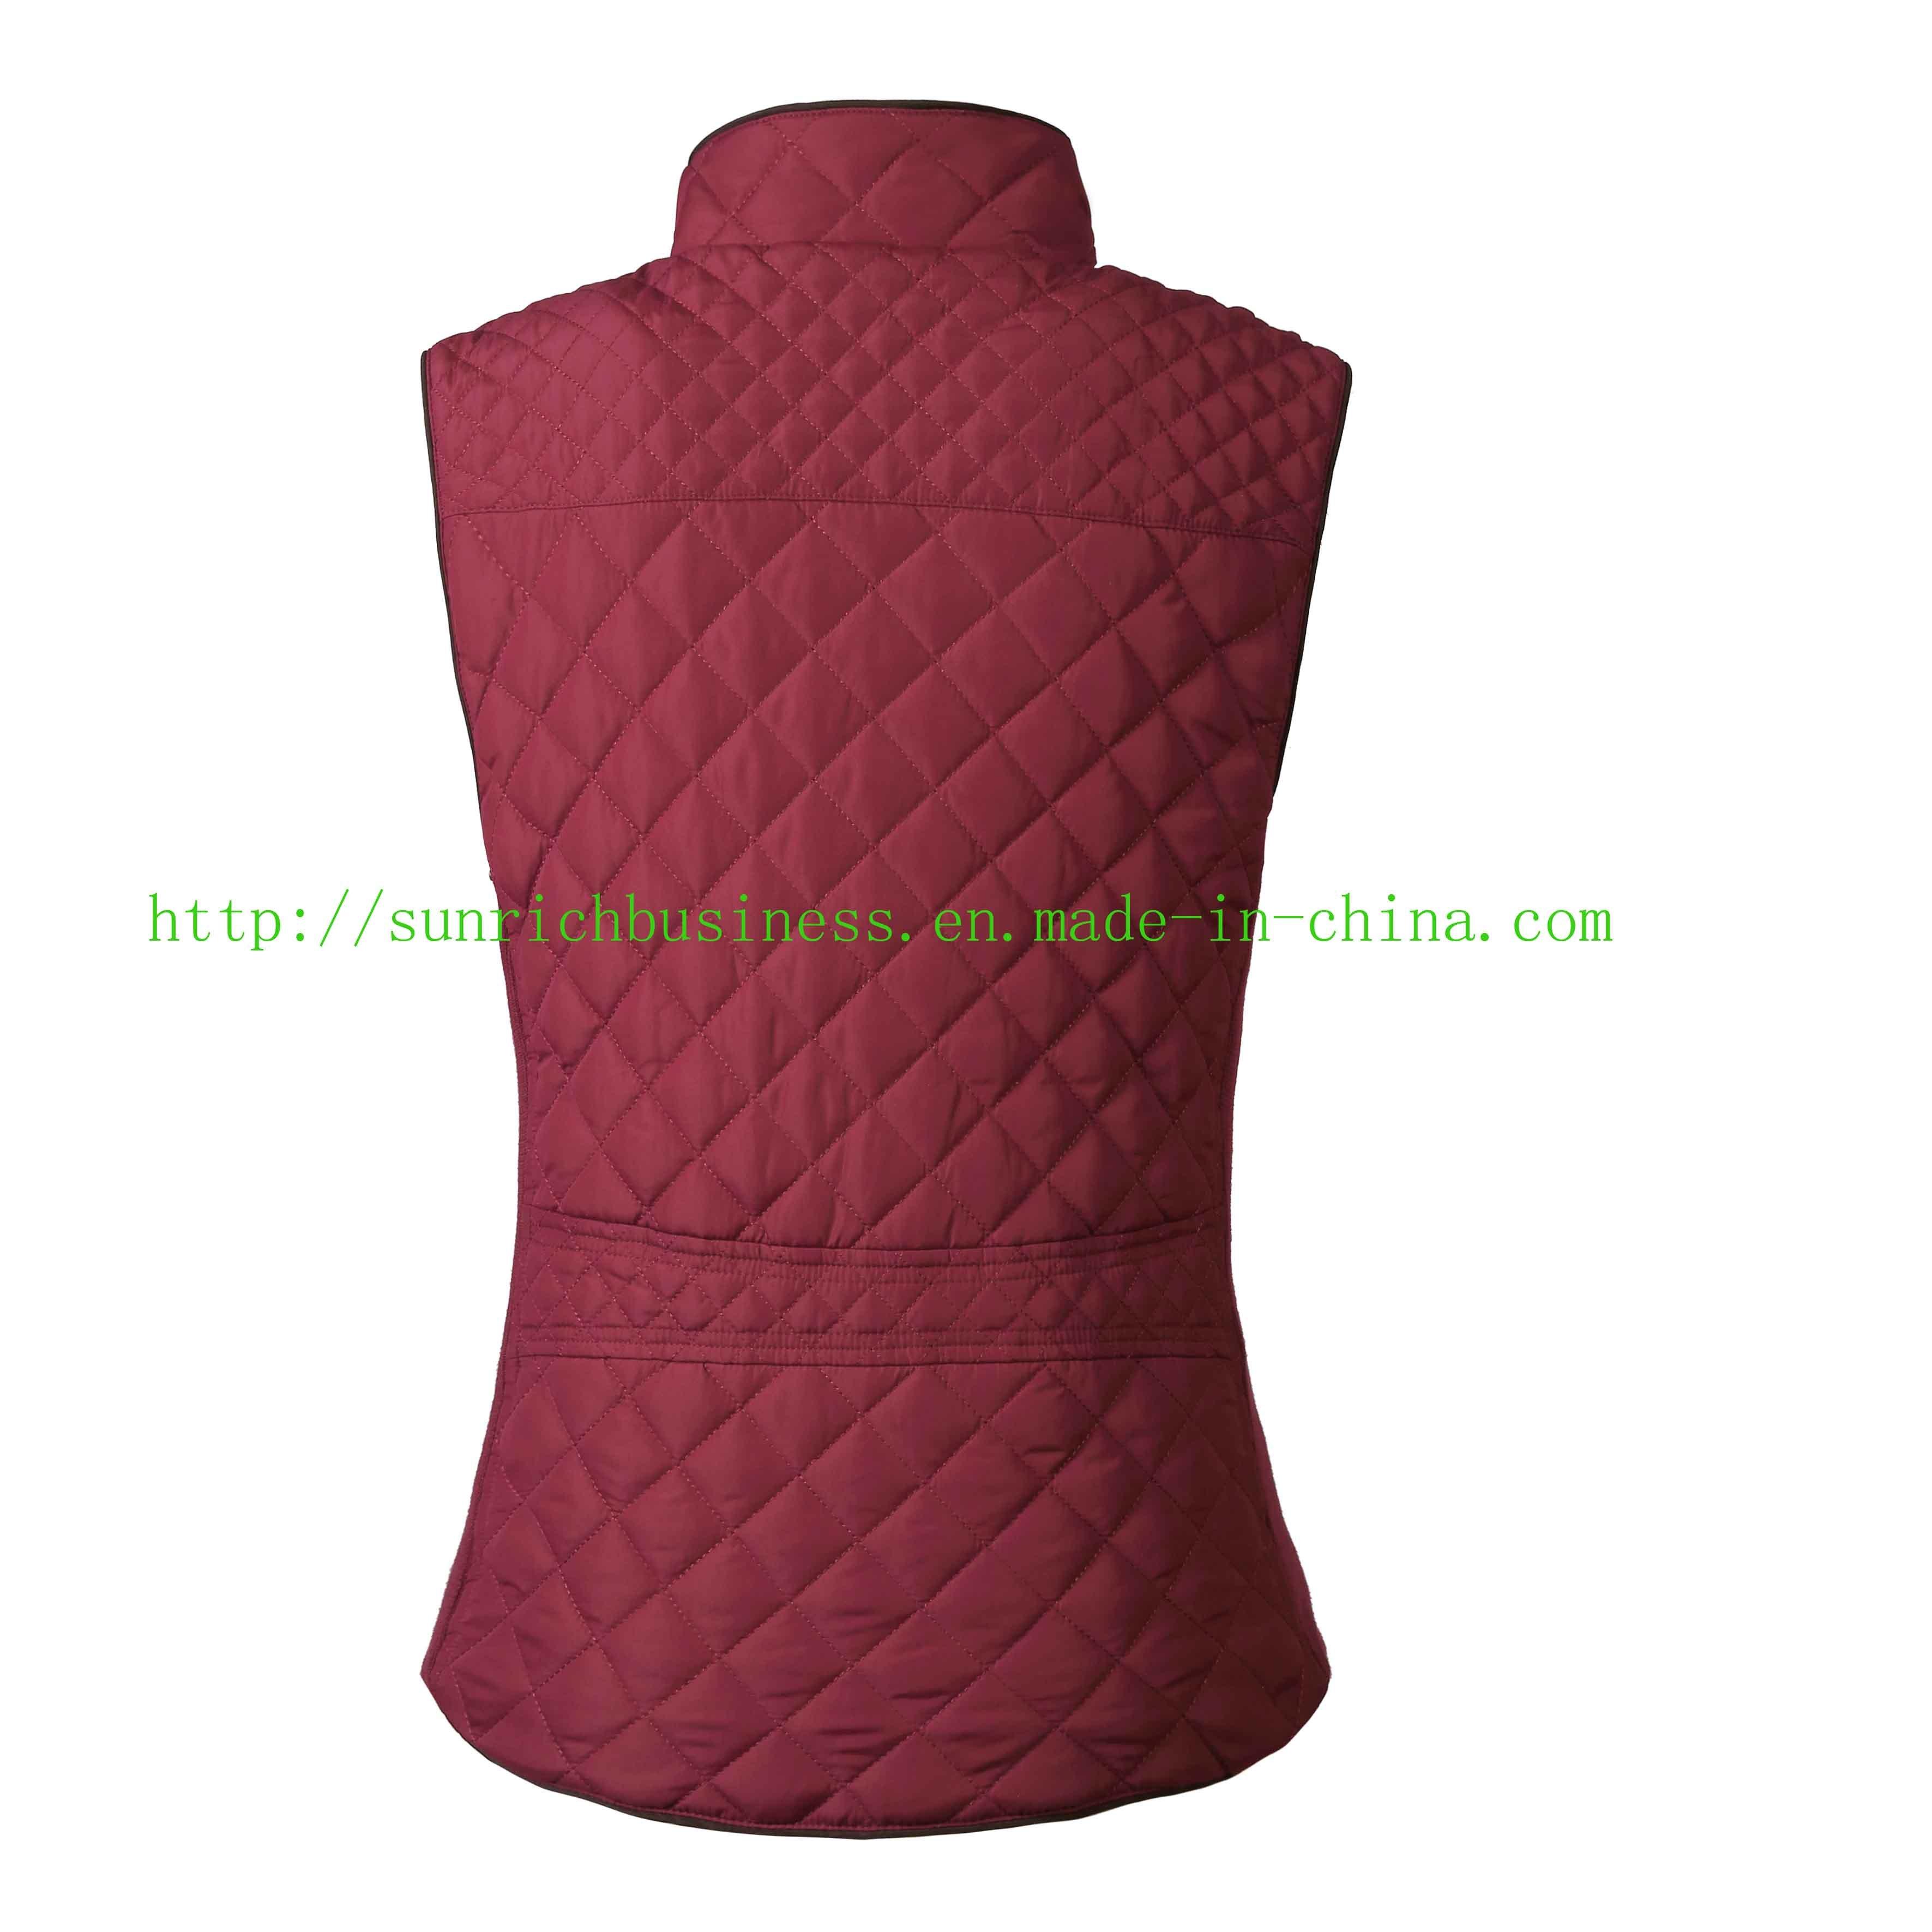 Women′s or Ladies Winter Qulited Padding Sleeveless Vest Jacket (FHL17003)